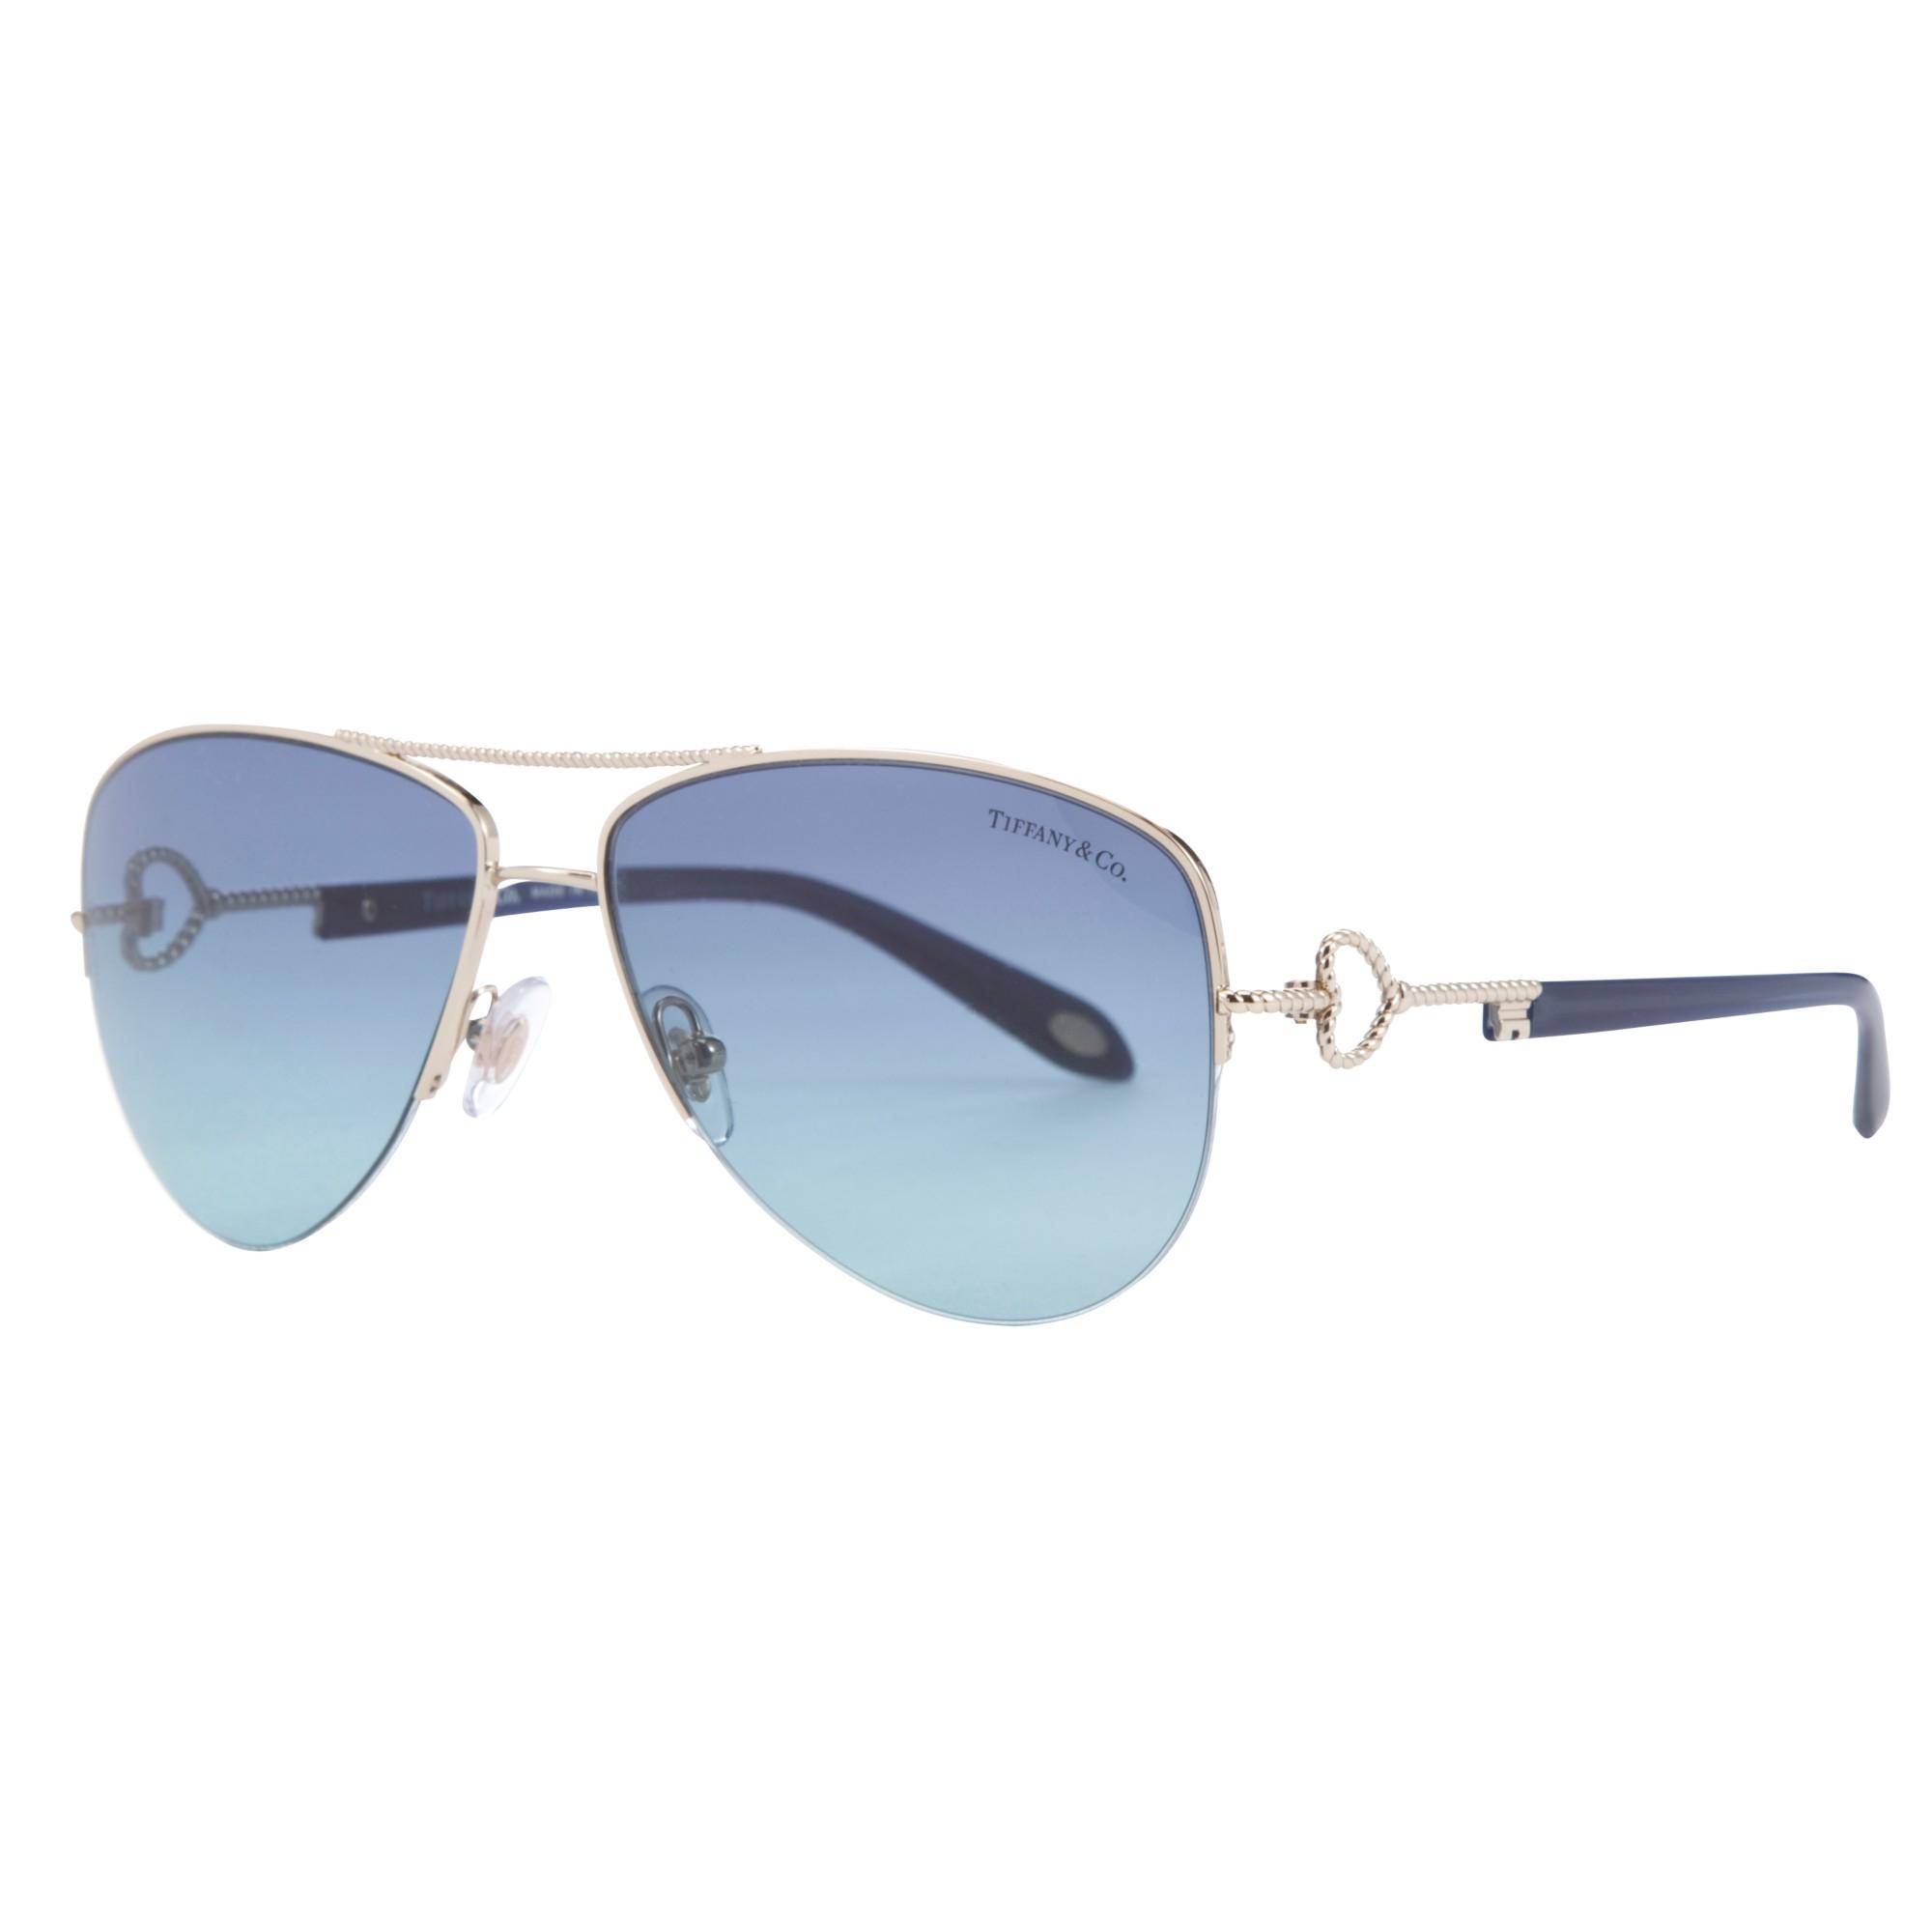 8058b64d2c Tiffany   Co. Tf3046 Aviator Sunglasses in Blue - Lyst